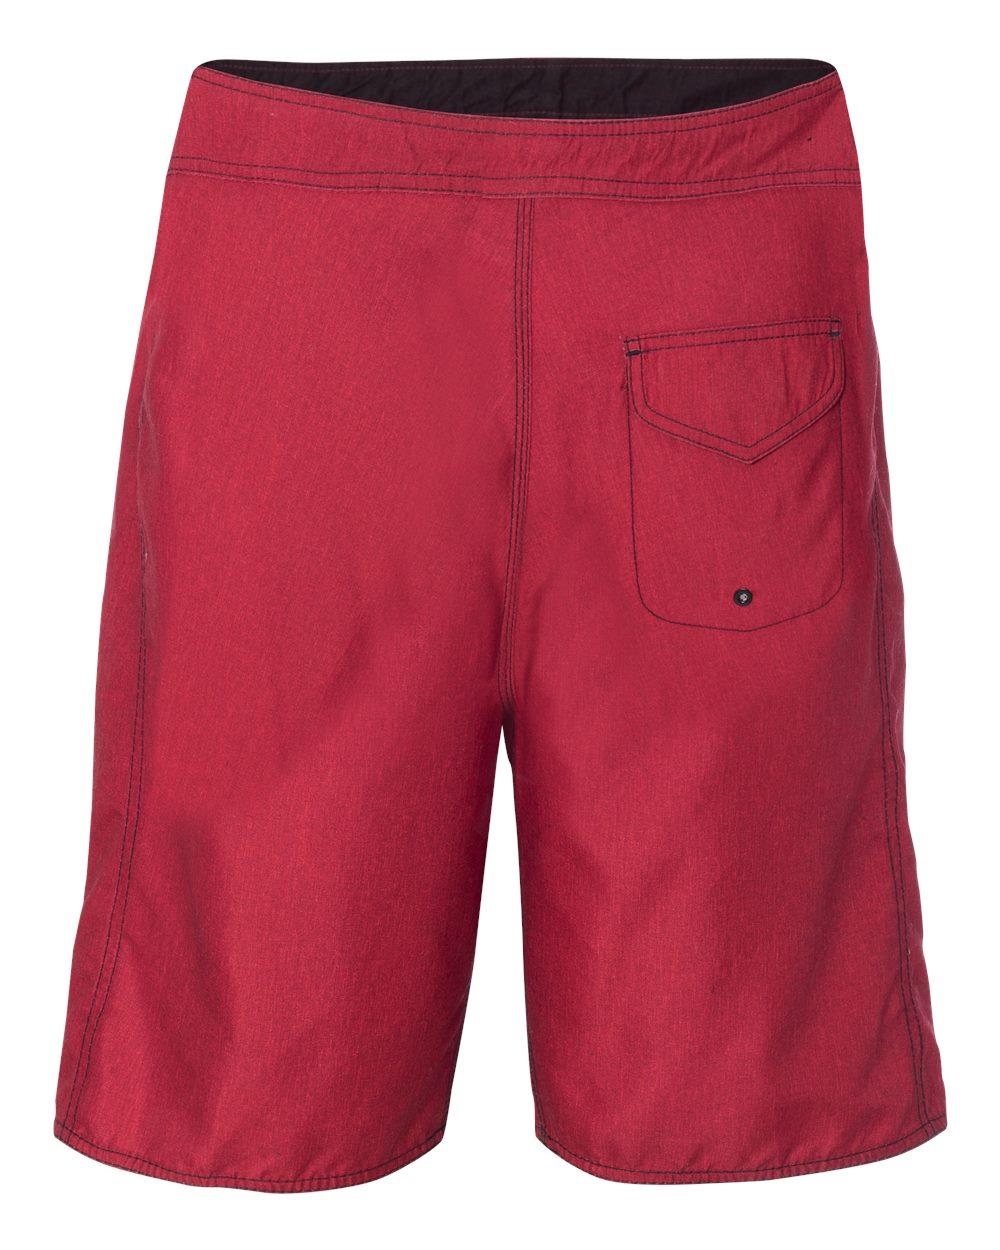 Burnside-Men-039-s-Heathered-Board-Shorts-B9305-30-40 thumbnail 13